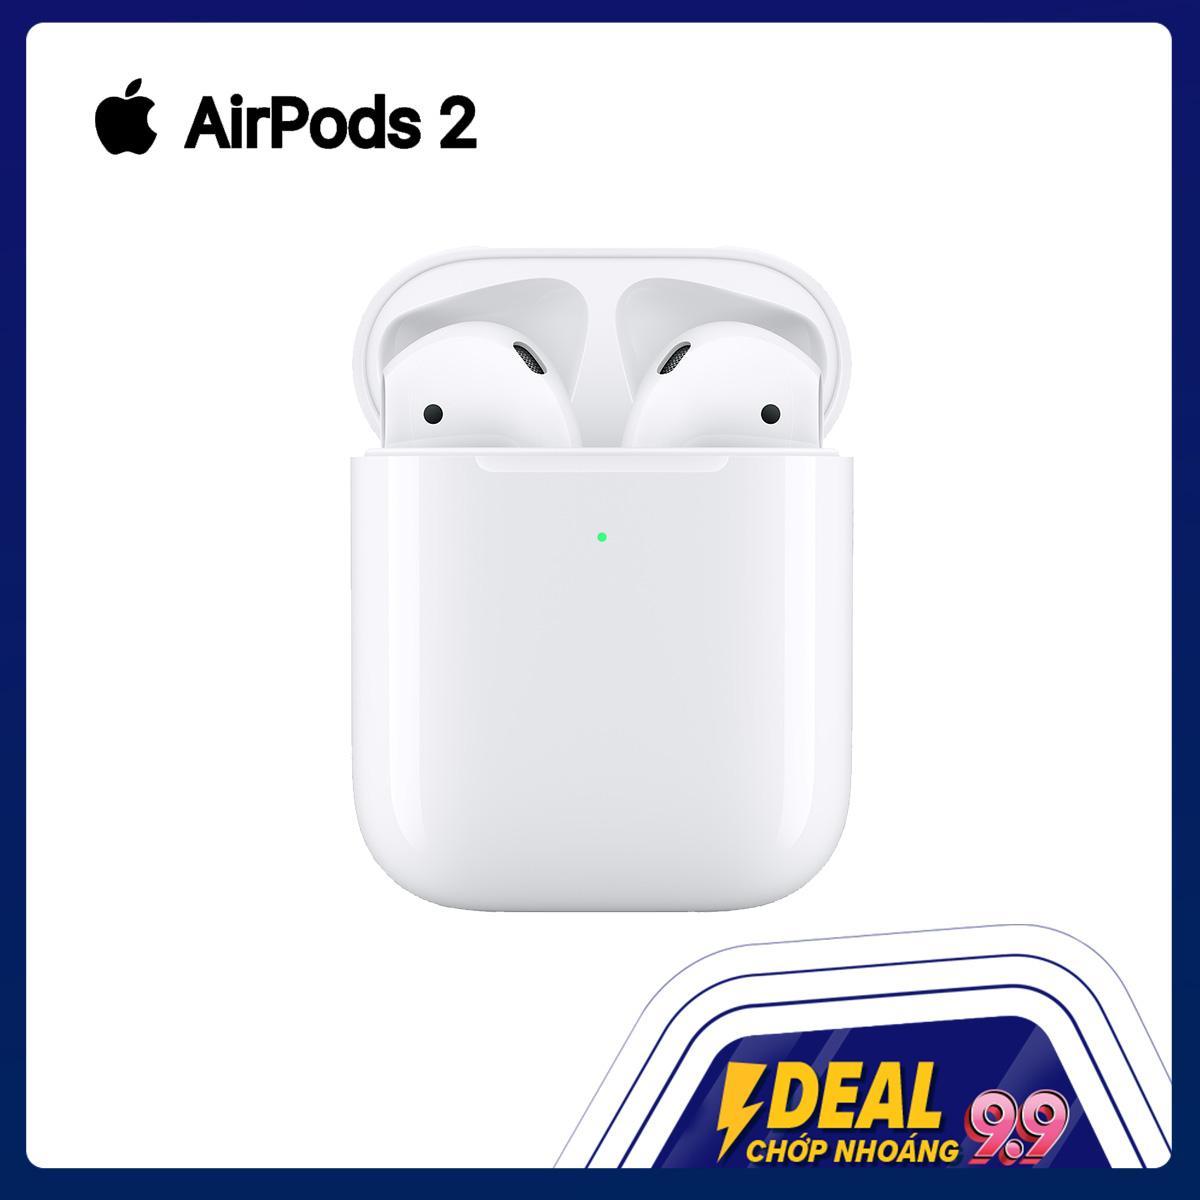 Tai Nghe Bluetooth Apple AirPods 2 bản sạc có dây